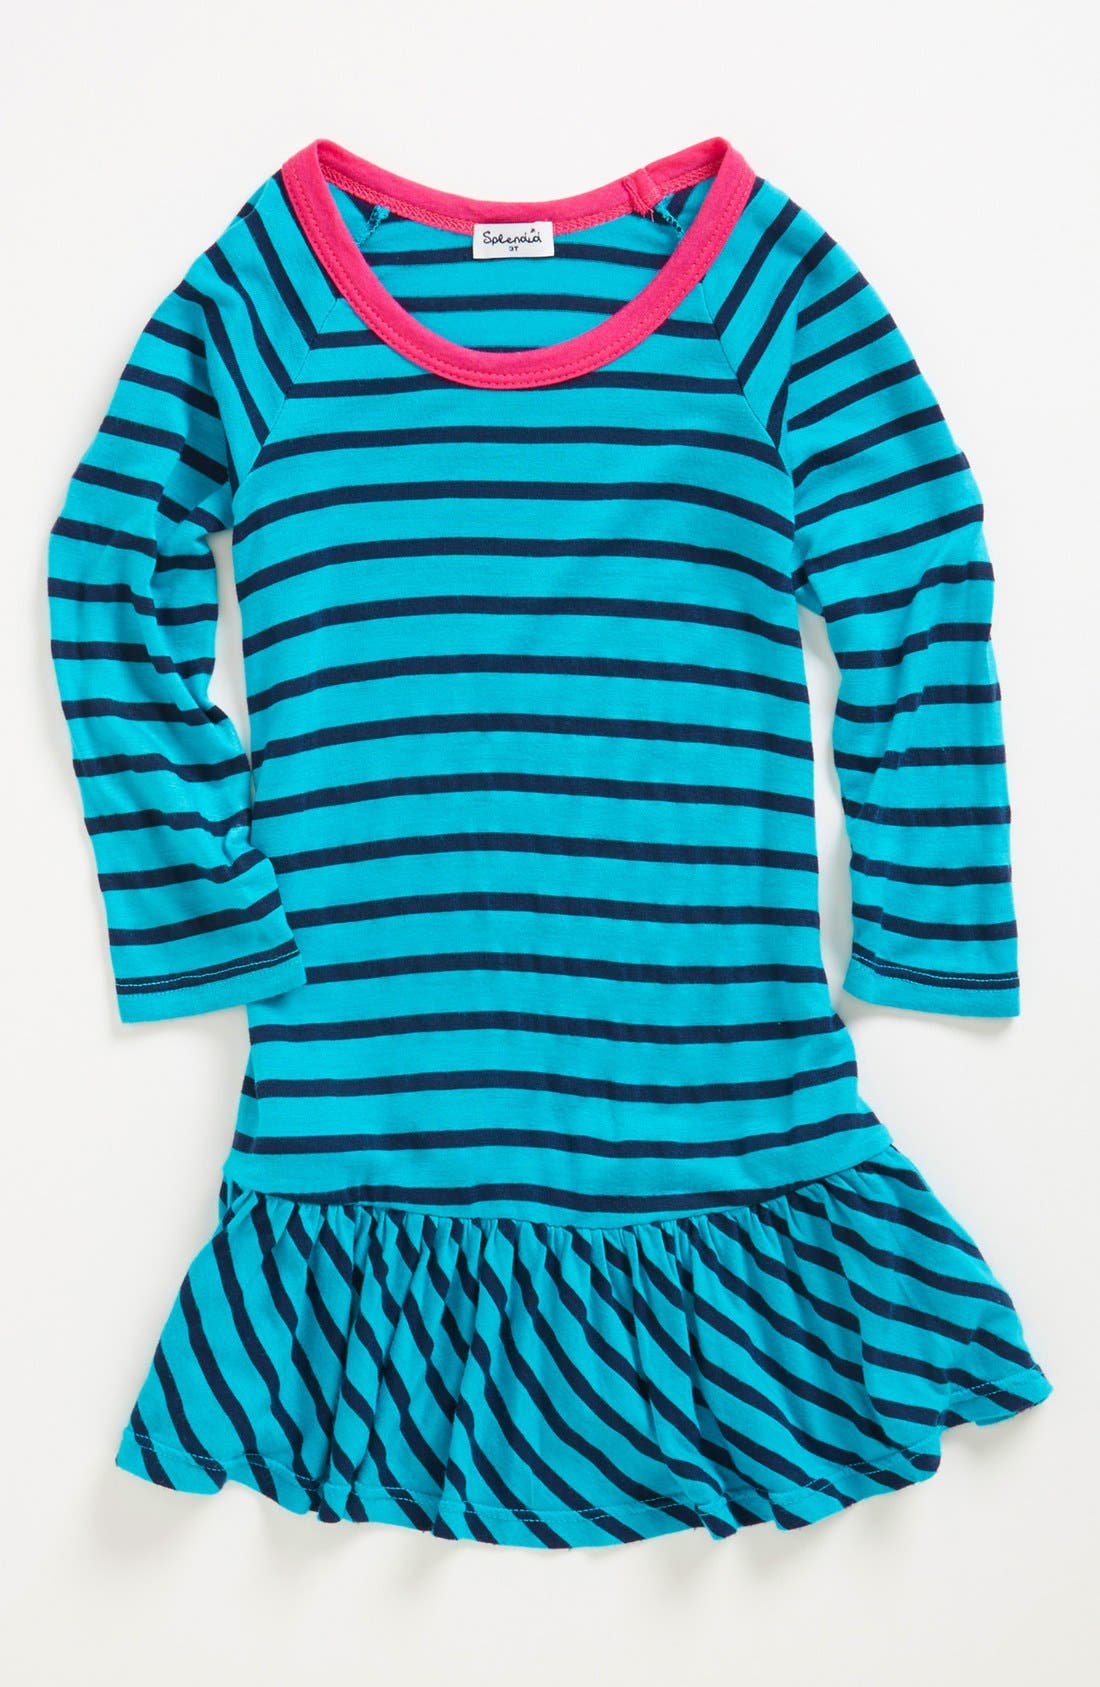 Alternate Image 1 Selected - Splendid Drop Waist Dress (Toddler Girls)